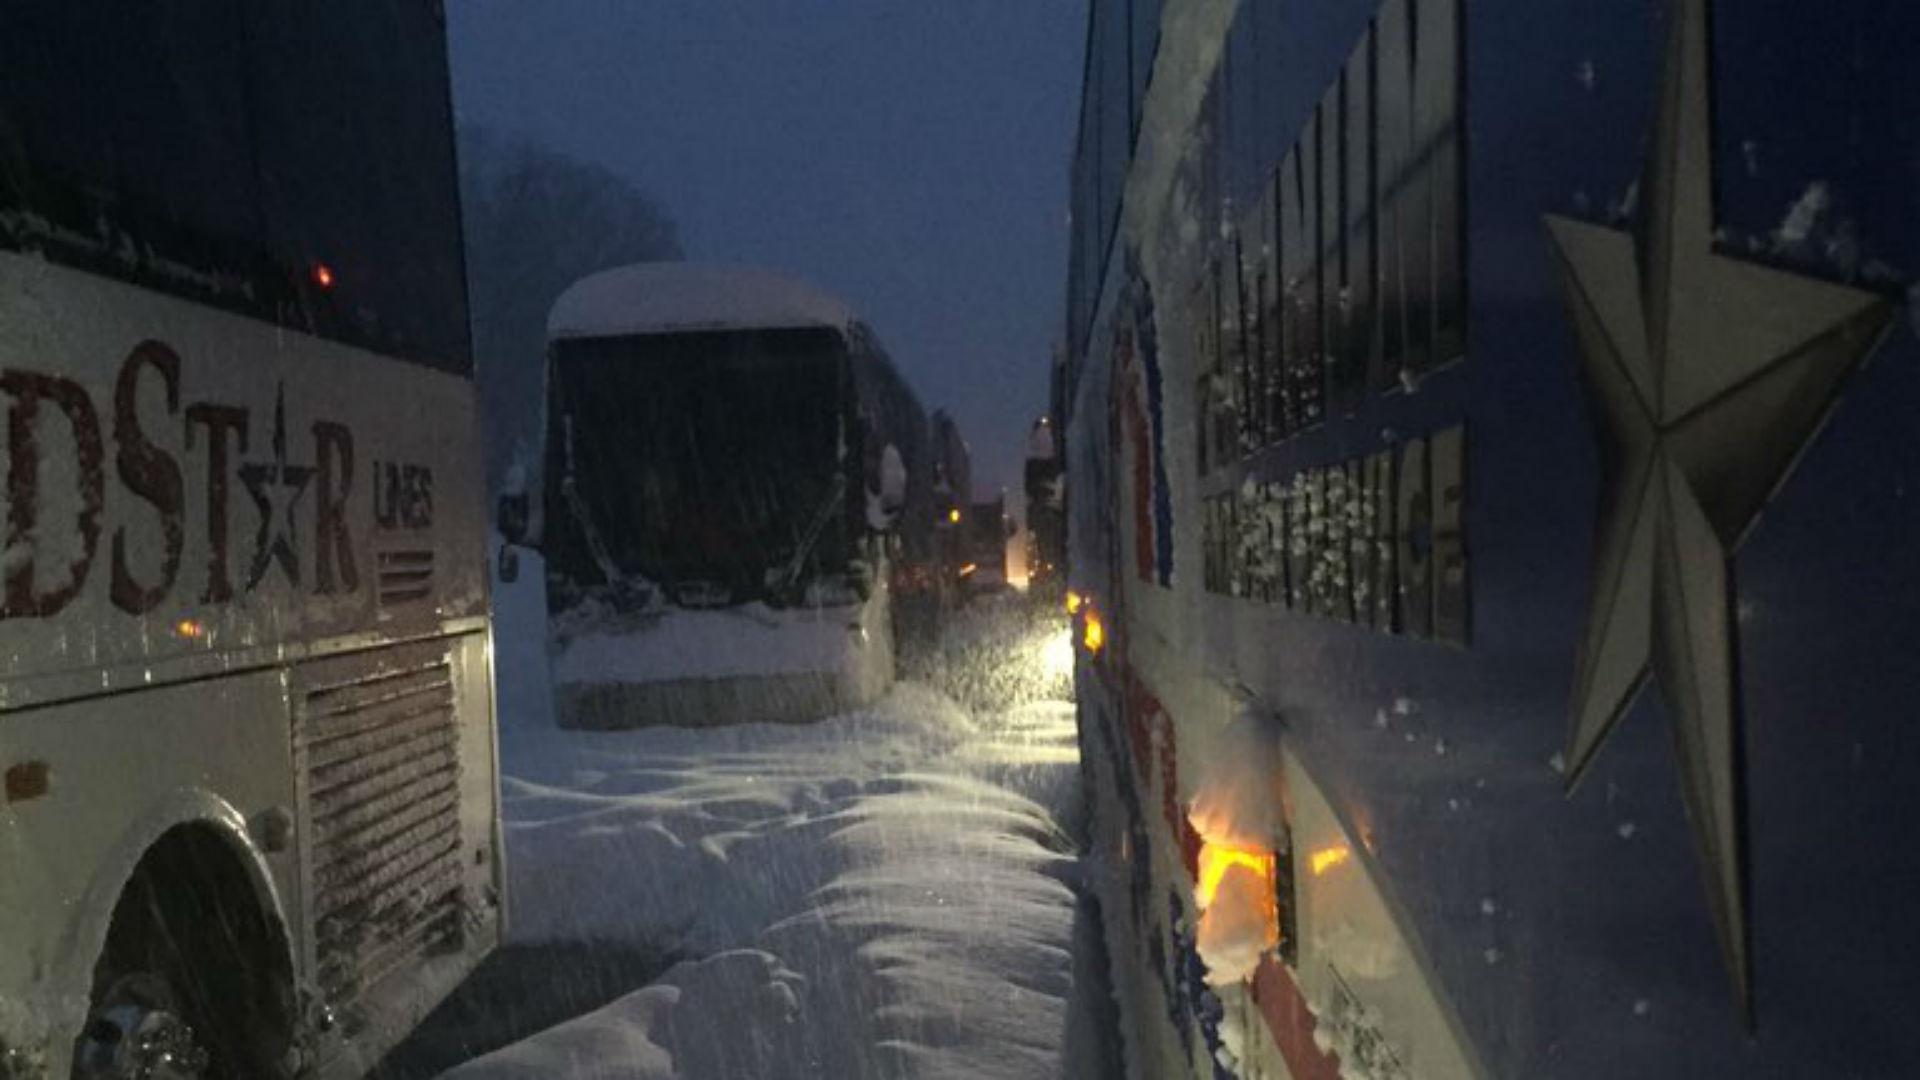 duquesne-bus-stuck-ftr-duquesne-012316